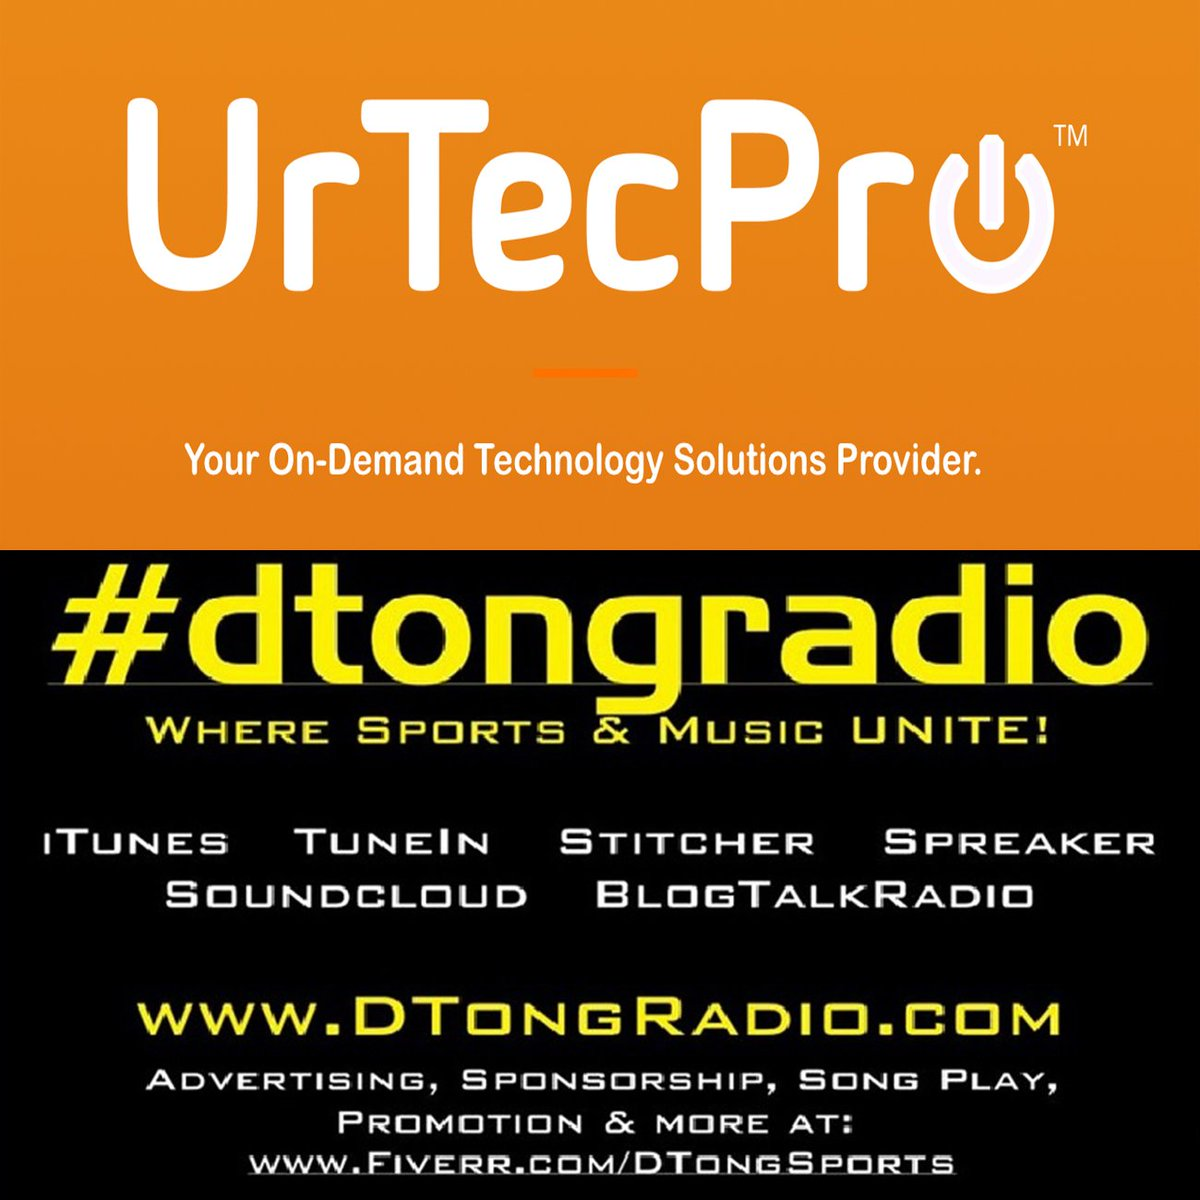 #NowPlaying LIVE on #dtongradio  NFL, NBA, College FB/BB, &amp; the BEST Indie Music  ft @thehausofpanda @shiyakataria @Deltiimo  Streaming at:  http://www. DTongRadio.com  &nbsp;    On #spreaker:  https://www. spreaker.com/user/dtongspor ts/nfl-week-11-nba-ncaa-fb-bb-the-best-indi?autoplay=1 &nbsp; …   On #Periscope :  https://www. pscp.tv/w/1zqKVMpzRZaxB  &nbsp;    #nfl #nba  #cfb #cbb #newmusicfriday<br>http://pic.twitter.com/5tuN3mZ5Mf